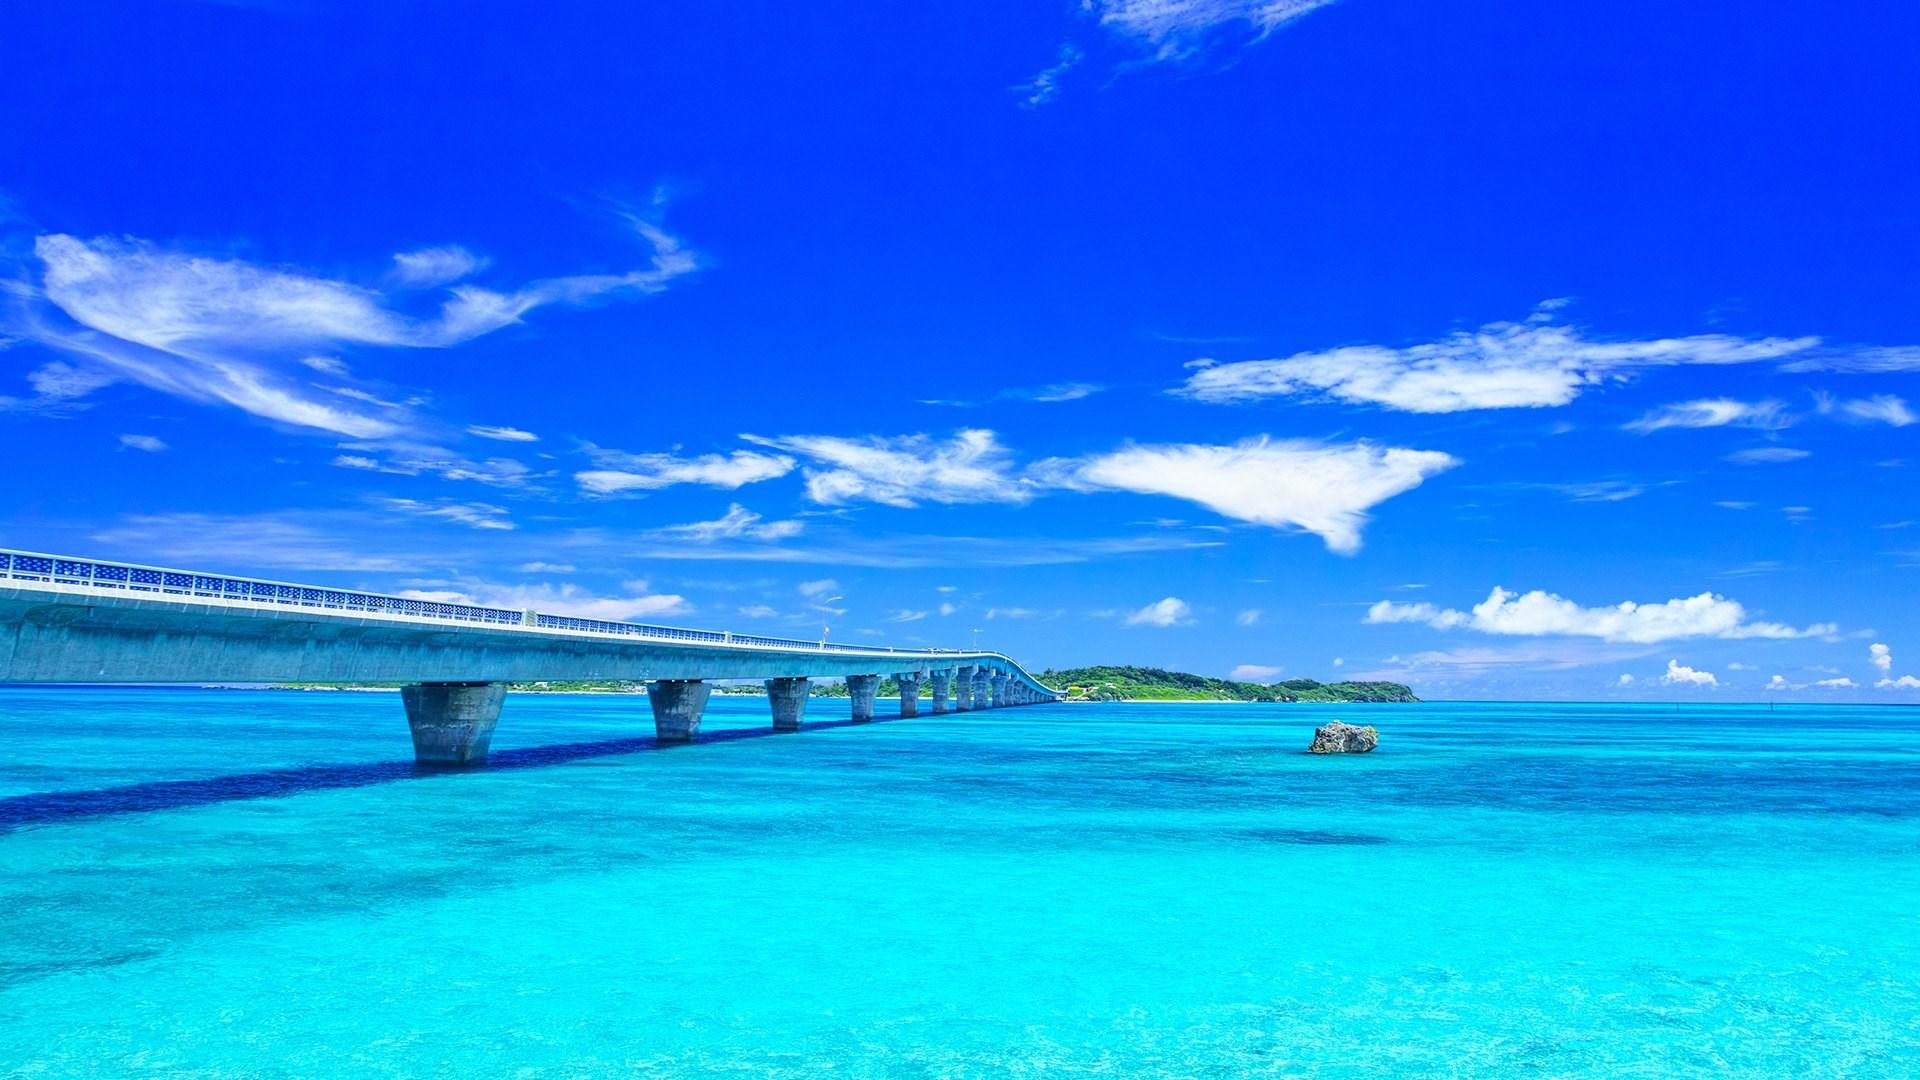 Bridge Ocean 1920x1080